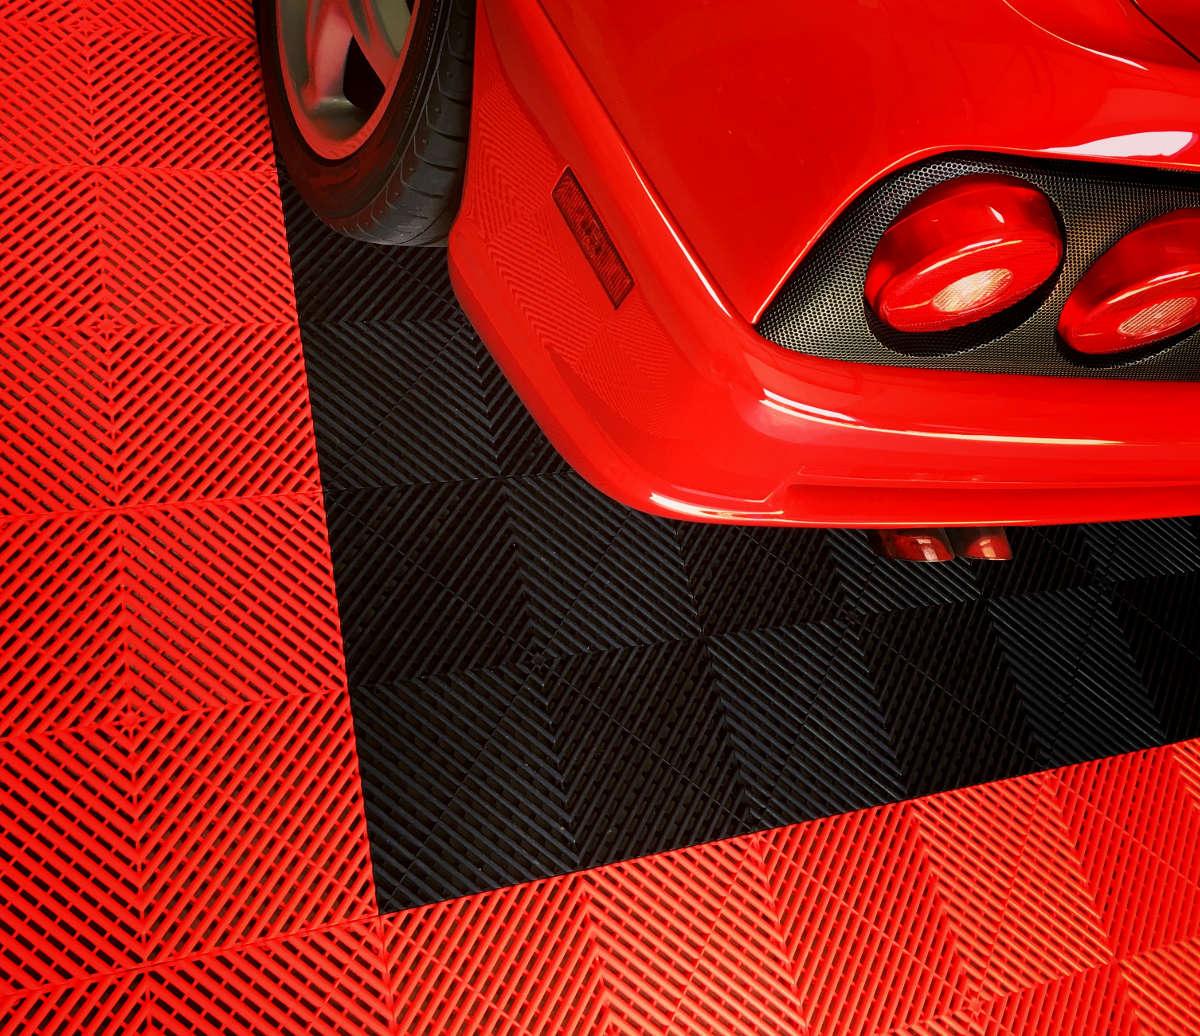 Dalles De Sol Garage, Atelier, Showroom, Magasin - Auto ... avec Prix Dalles Izifloor